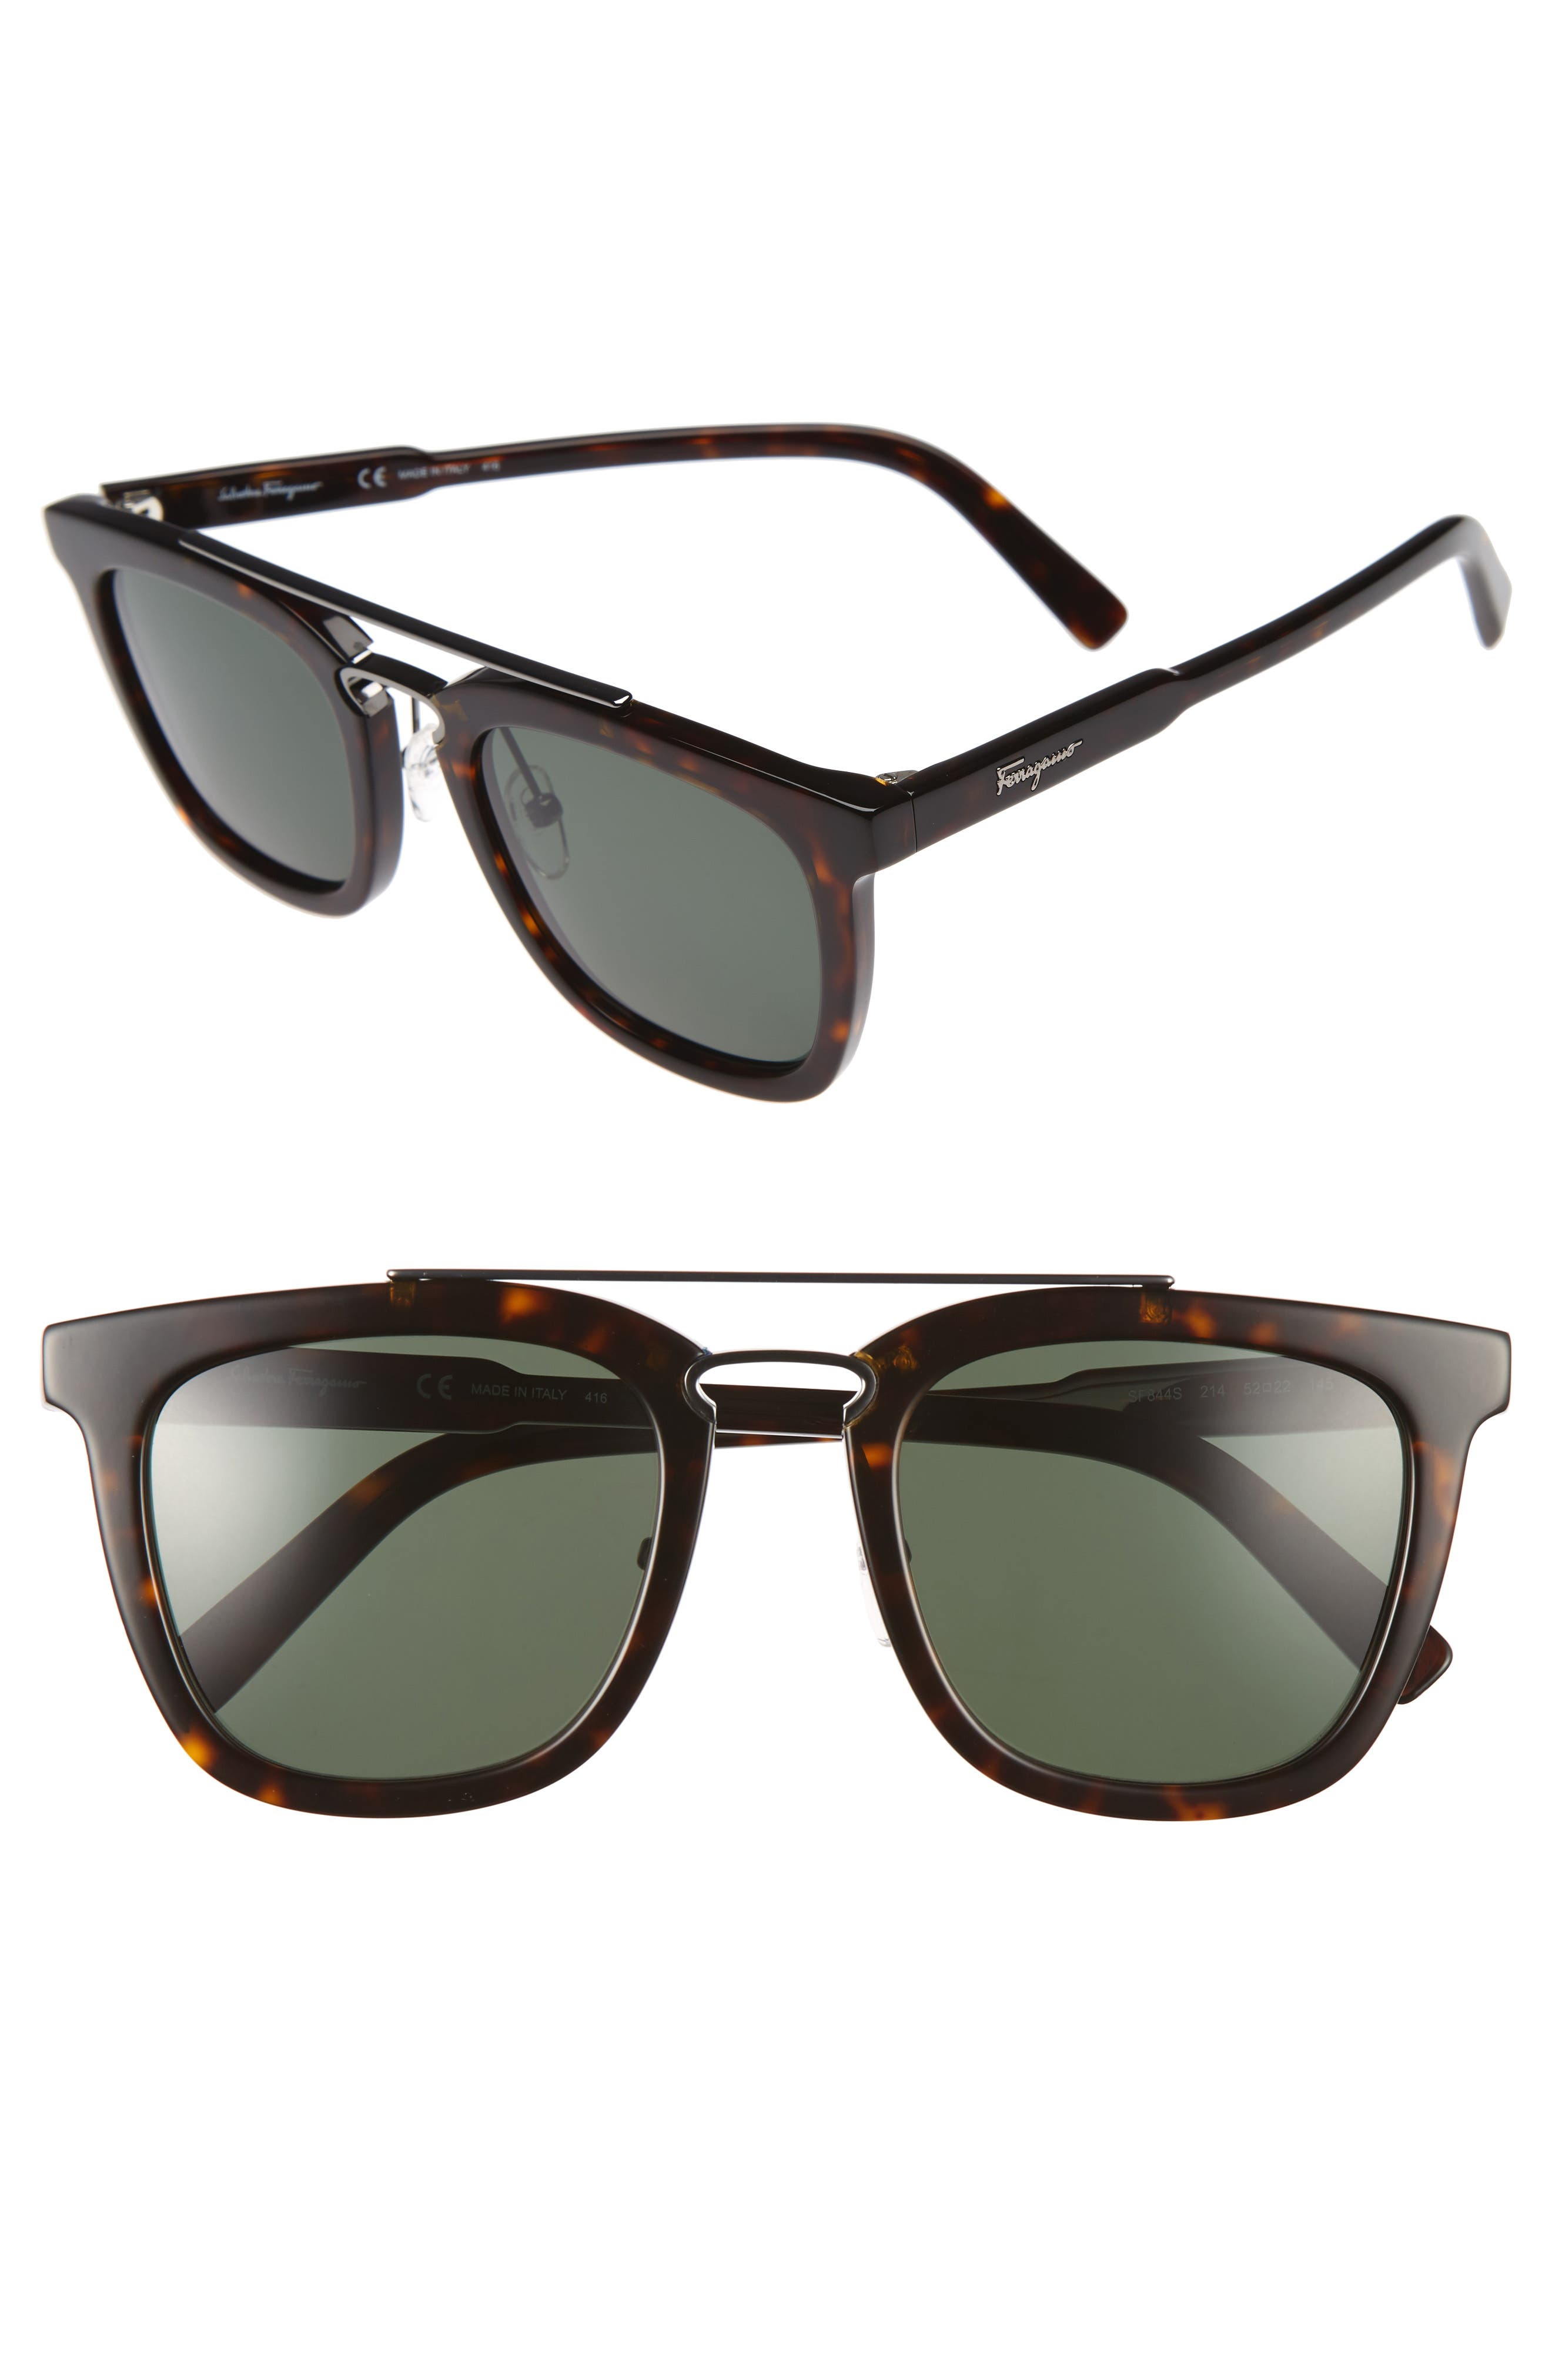 Salvatore Ferragamo 52mm Sunglasses